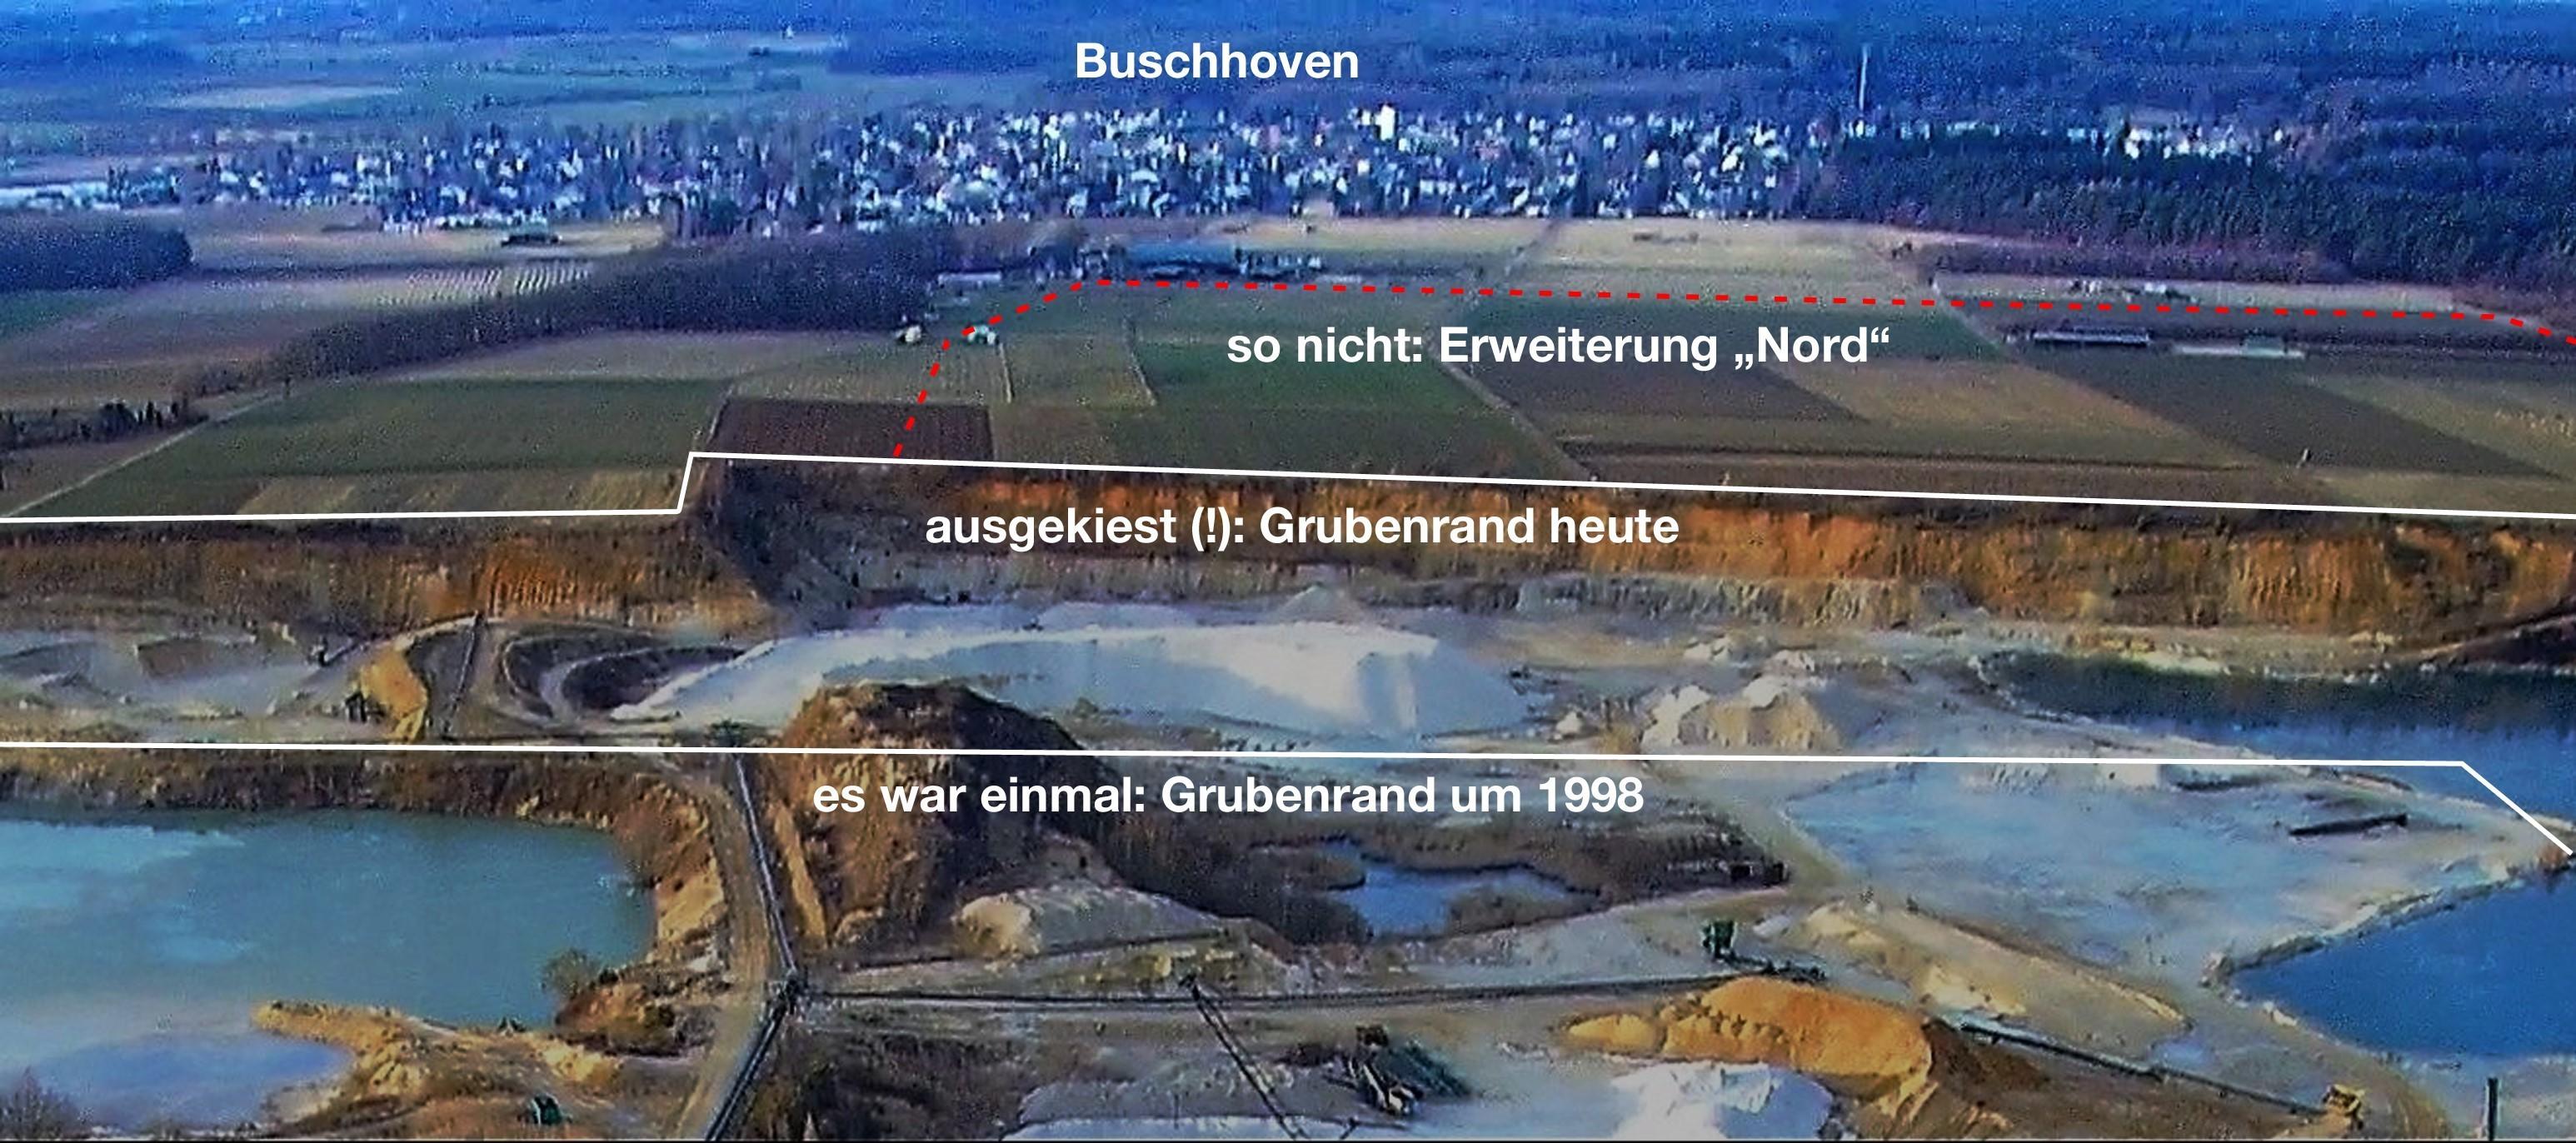 Kiesabgrabung südlich Buschhoven